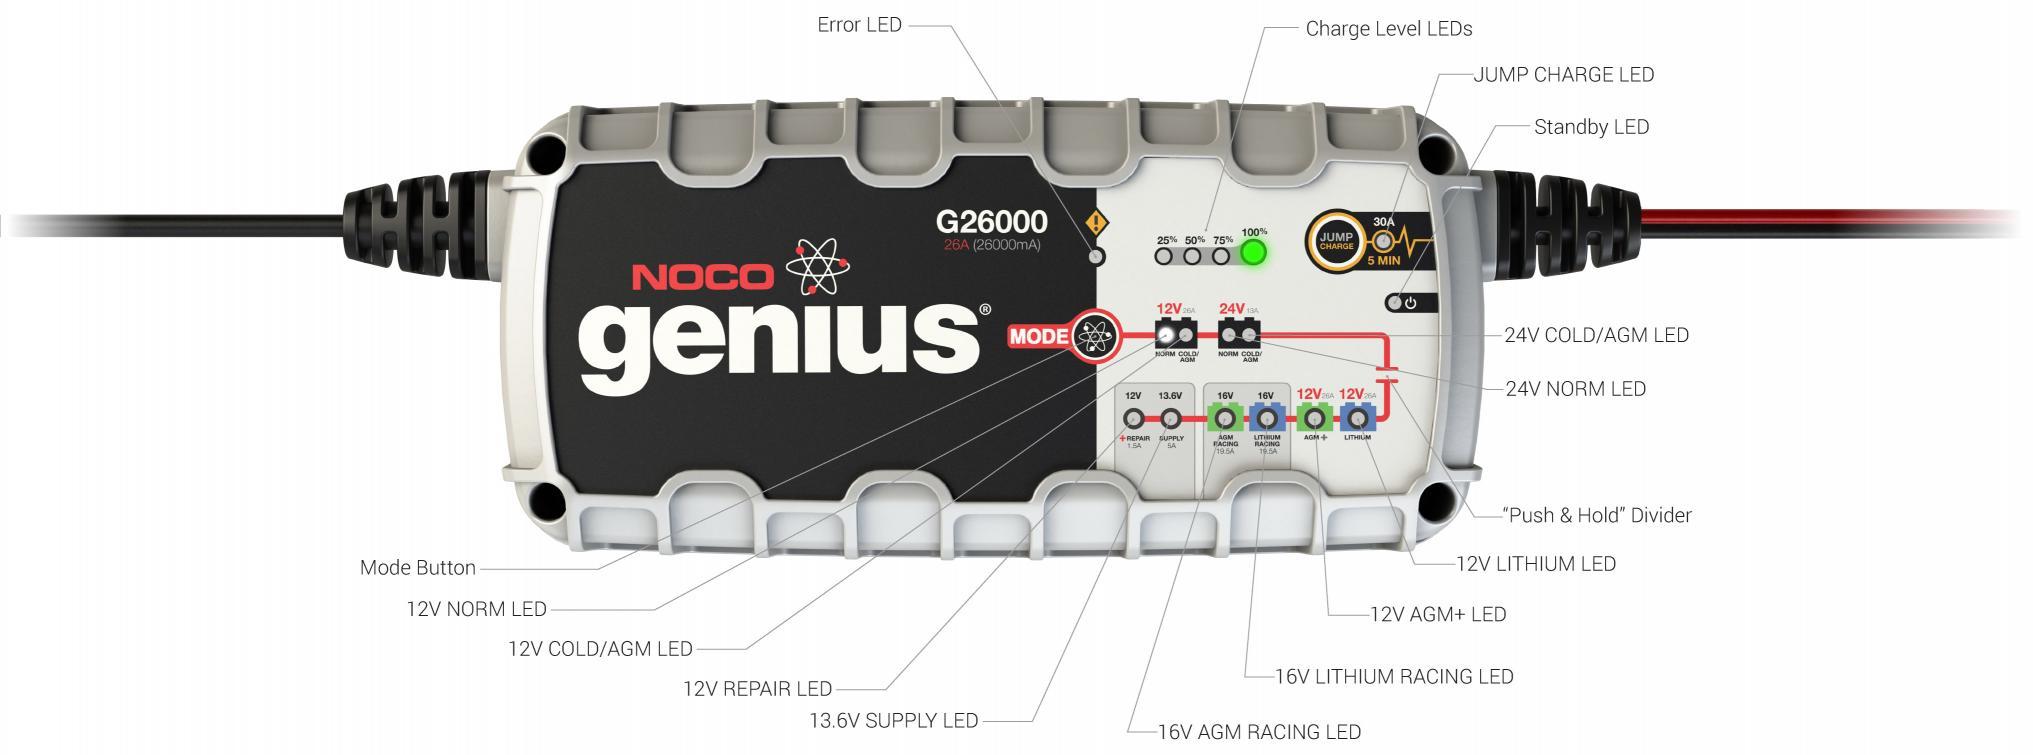 g26000-12v-16v-24v-automotive-car-battery-charger-agm-deep-cycle-lithium-desulfator.jpg